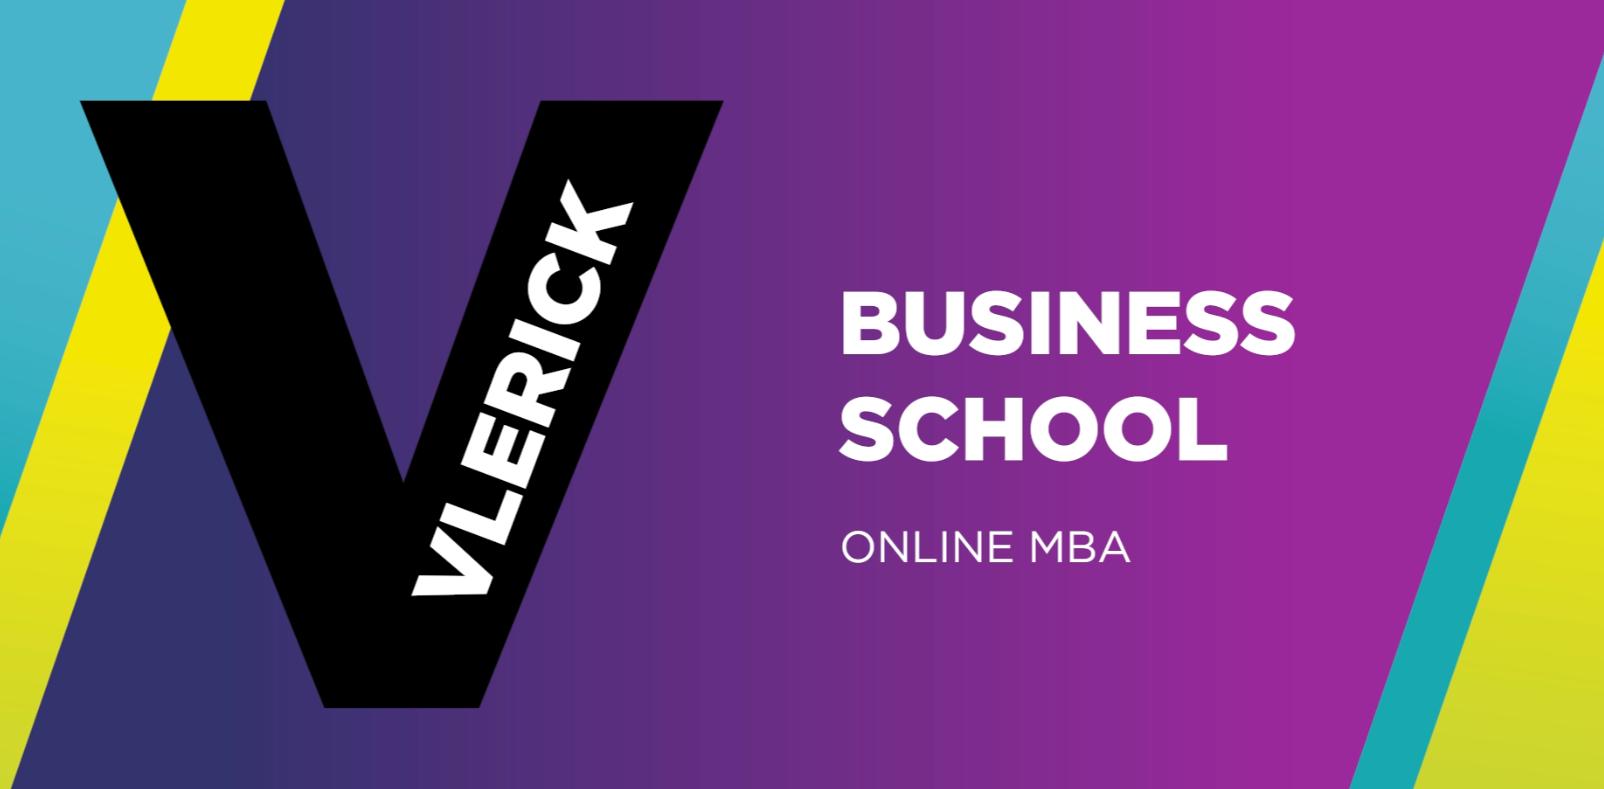 Vlerick Buisness School